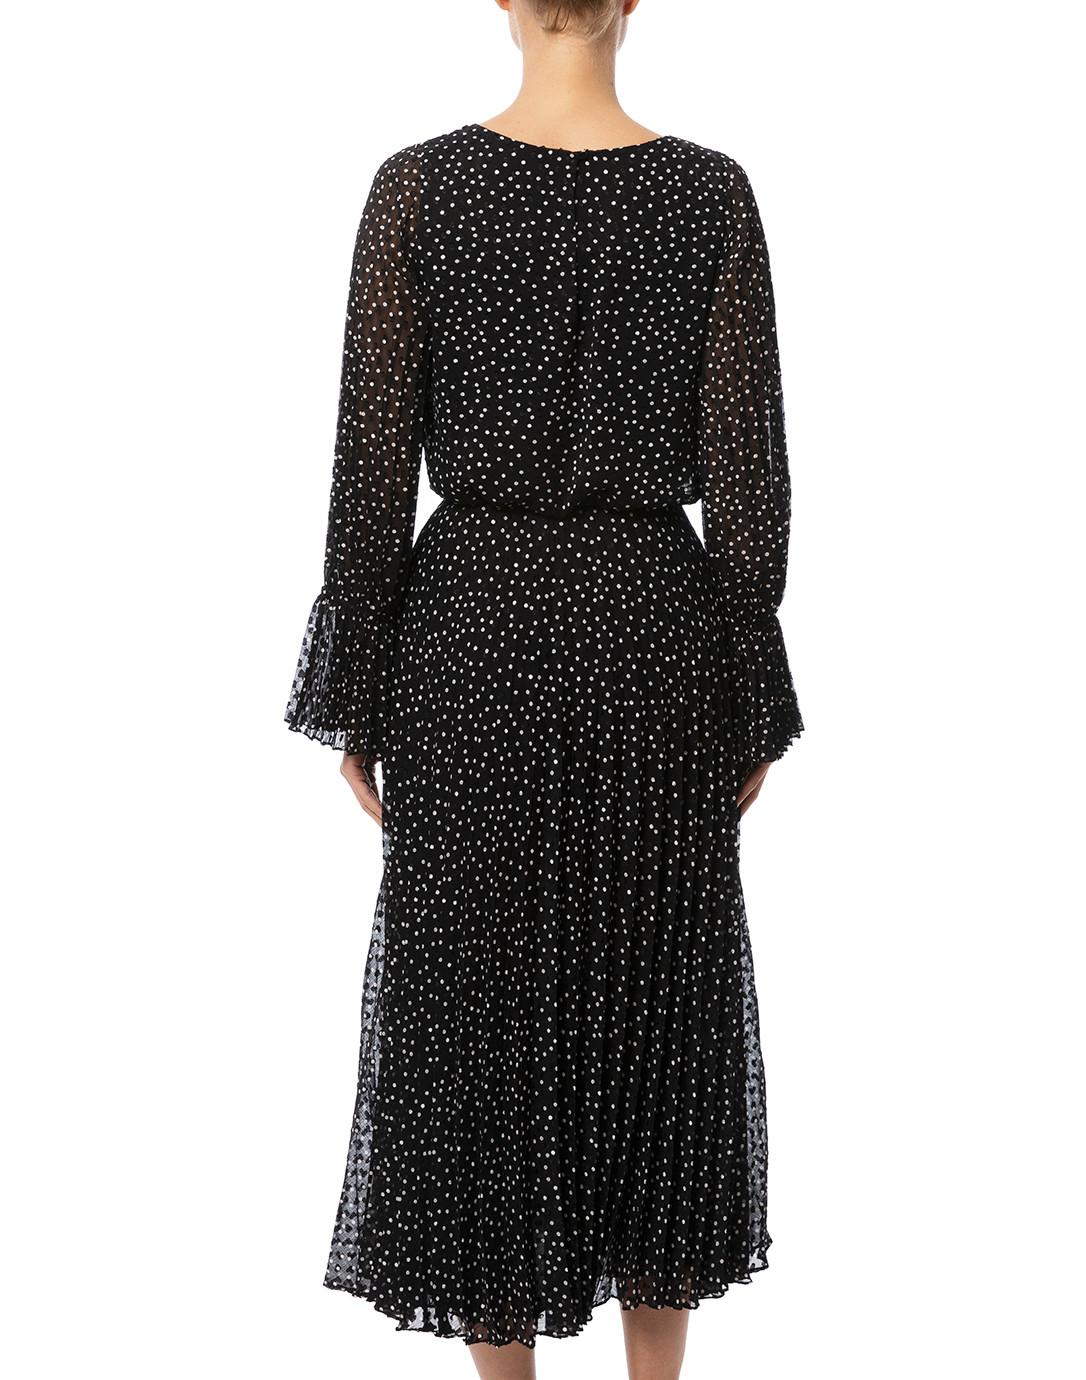 7d09f2fb48 Black and White Polka Dot Pleated Maxi Dress